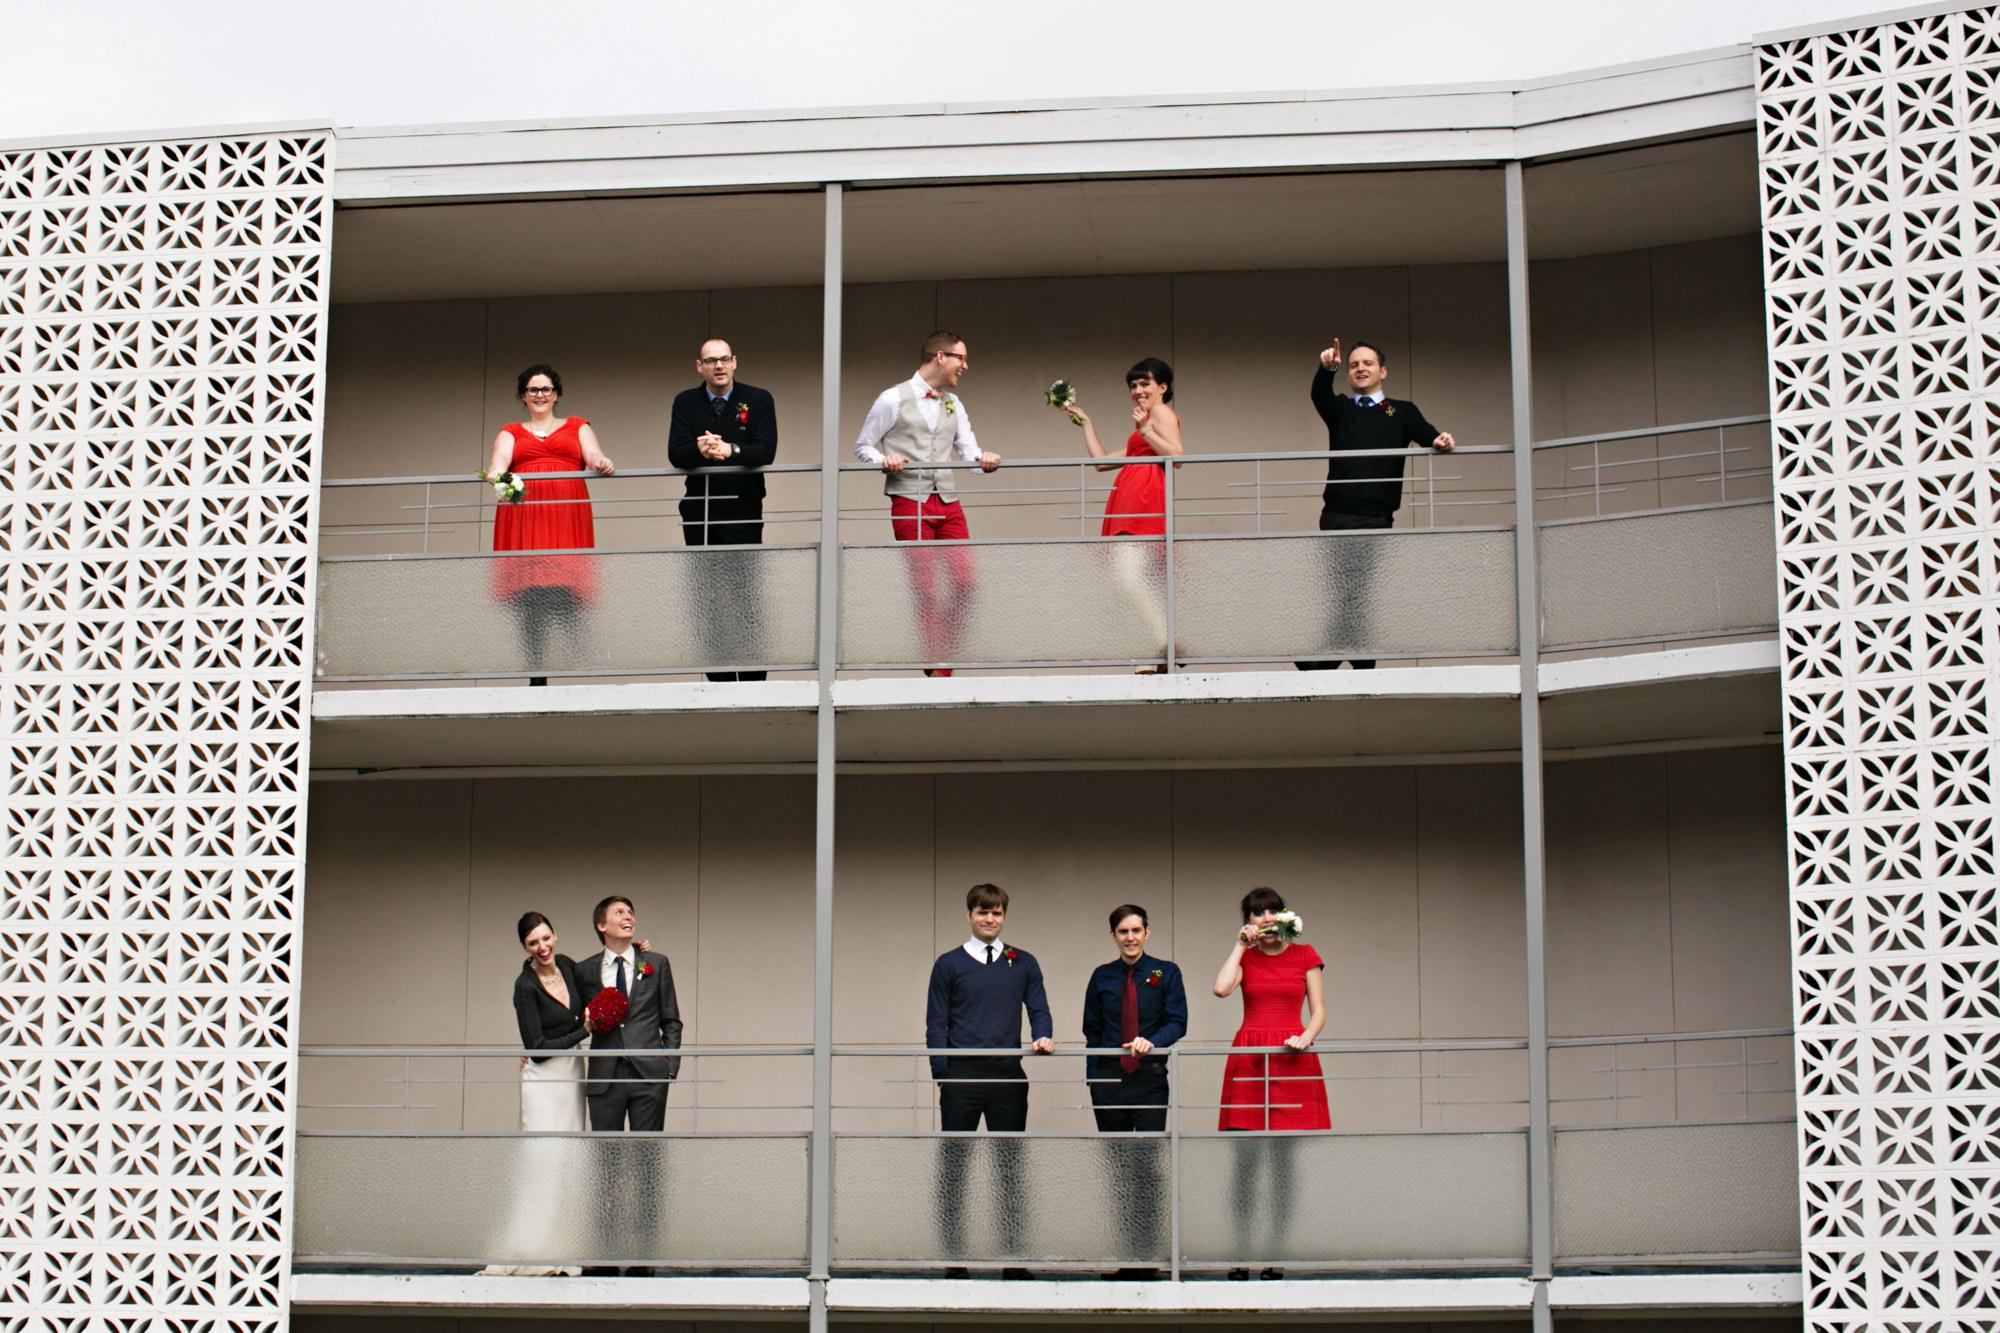 Group portrait on hotel balcony - photo by Jenny Jimenez